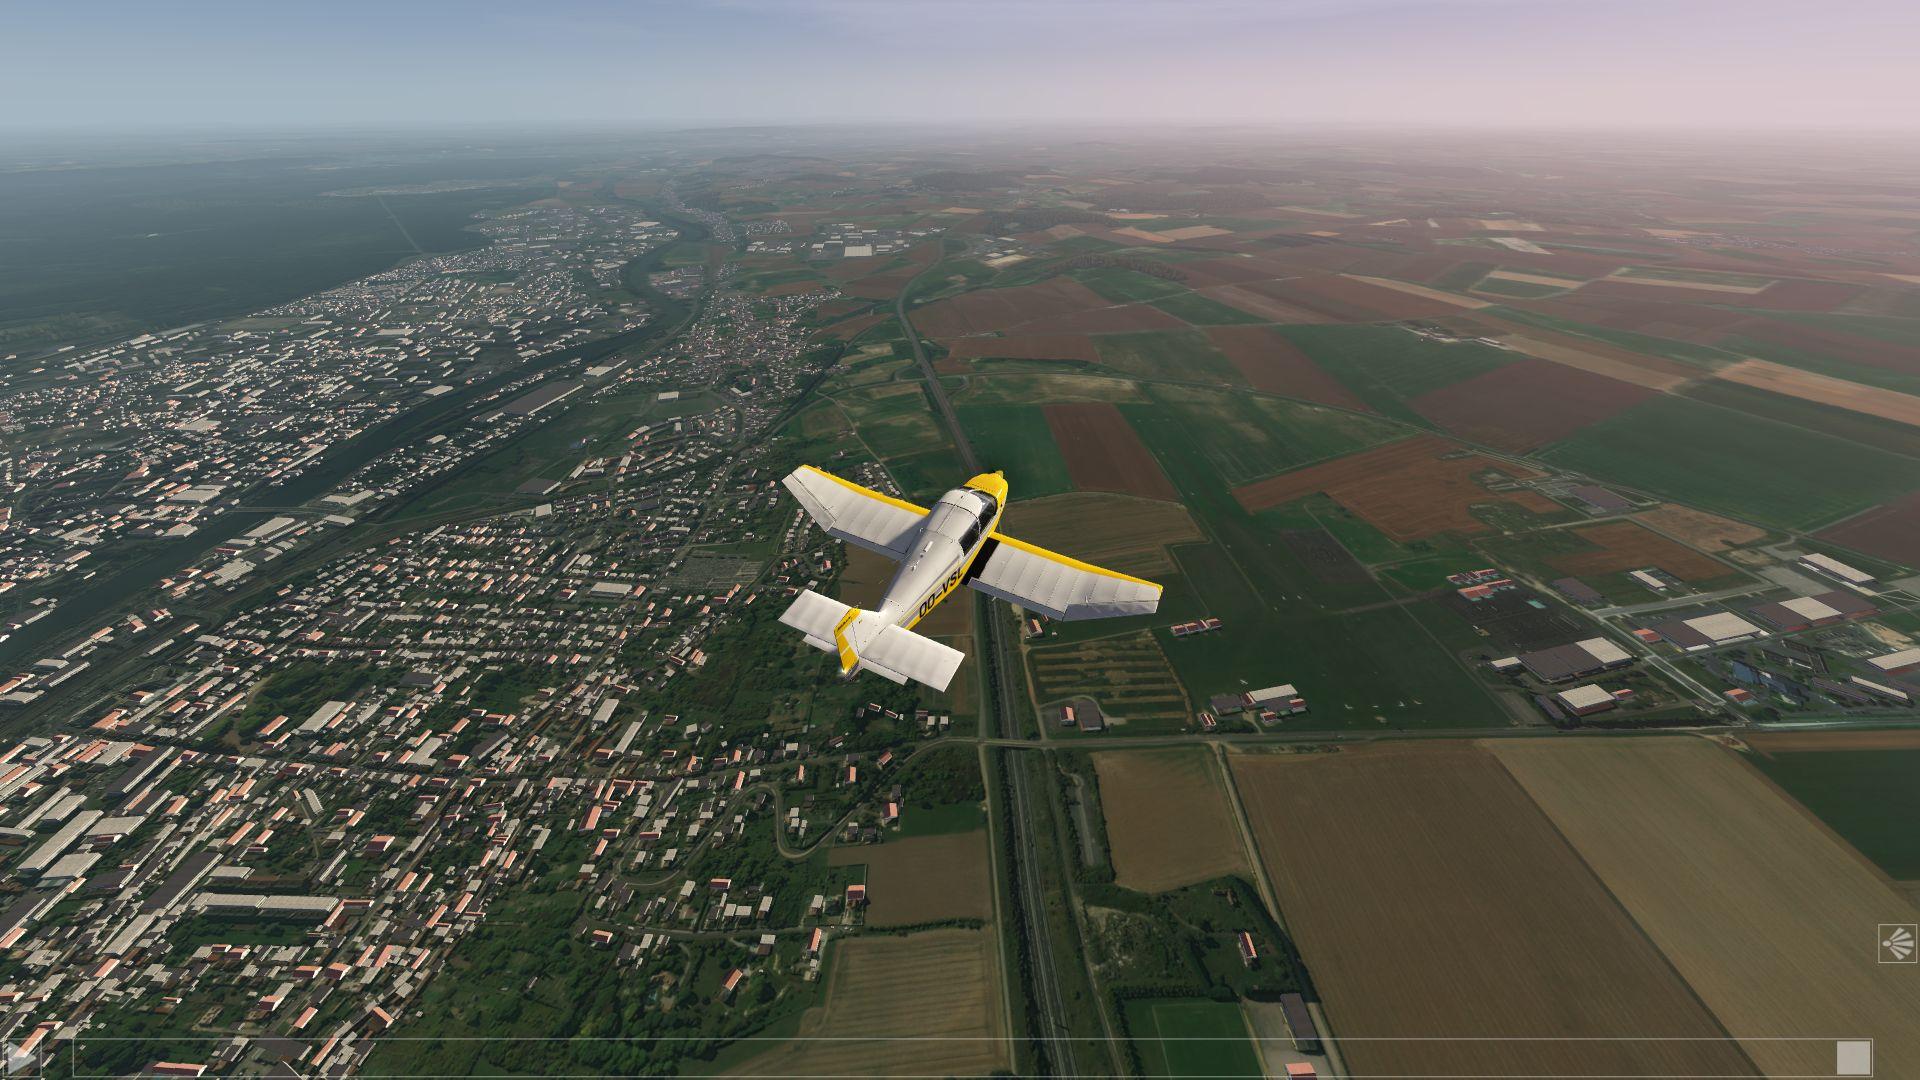 http://www.pilote-virtuel.com/img/gallery/1517065628.jpg